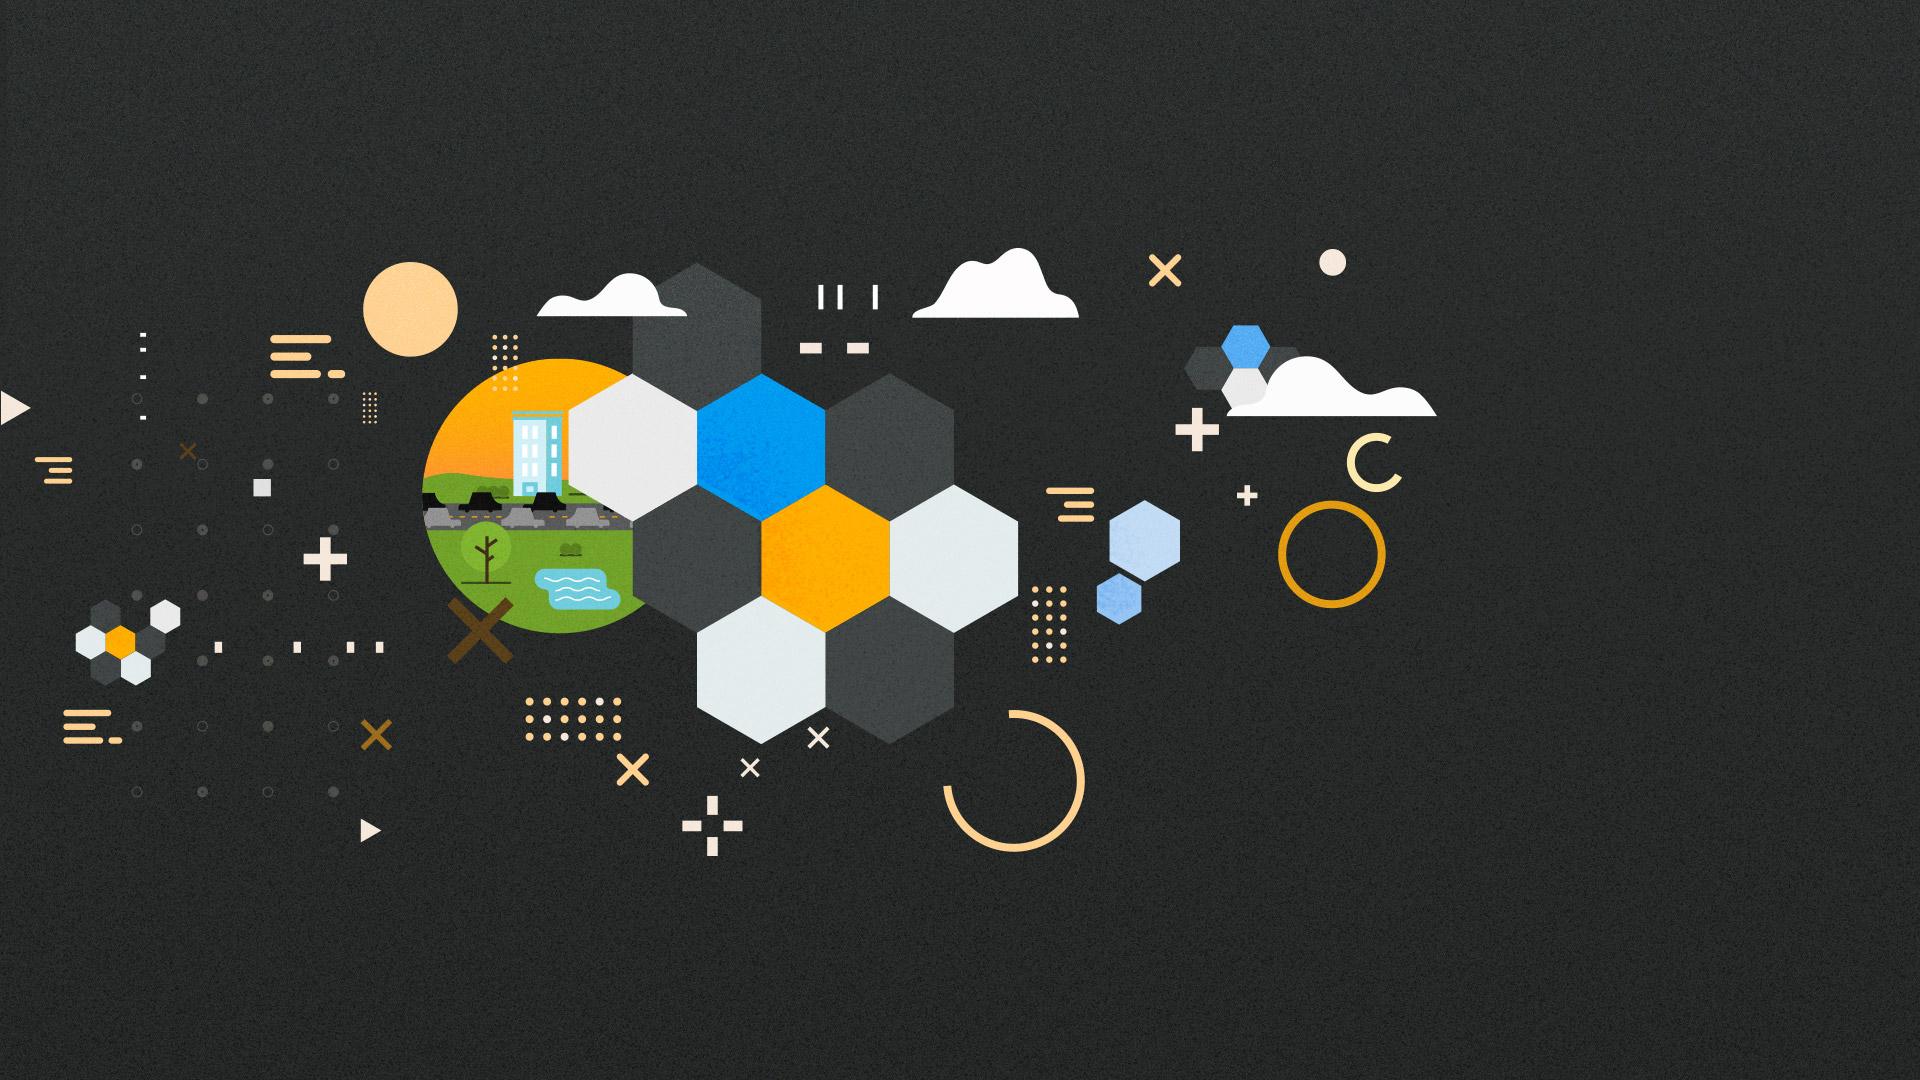 FRAME-4-IBM-JerryNelson